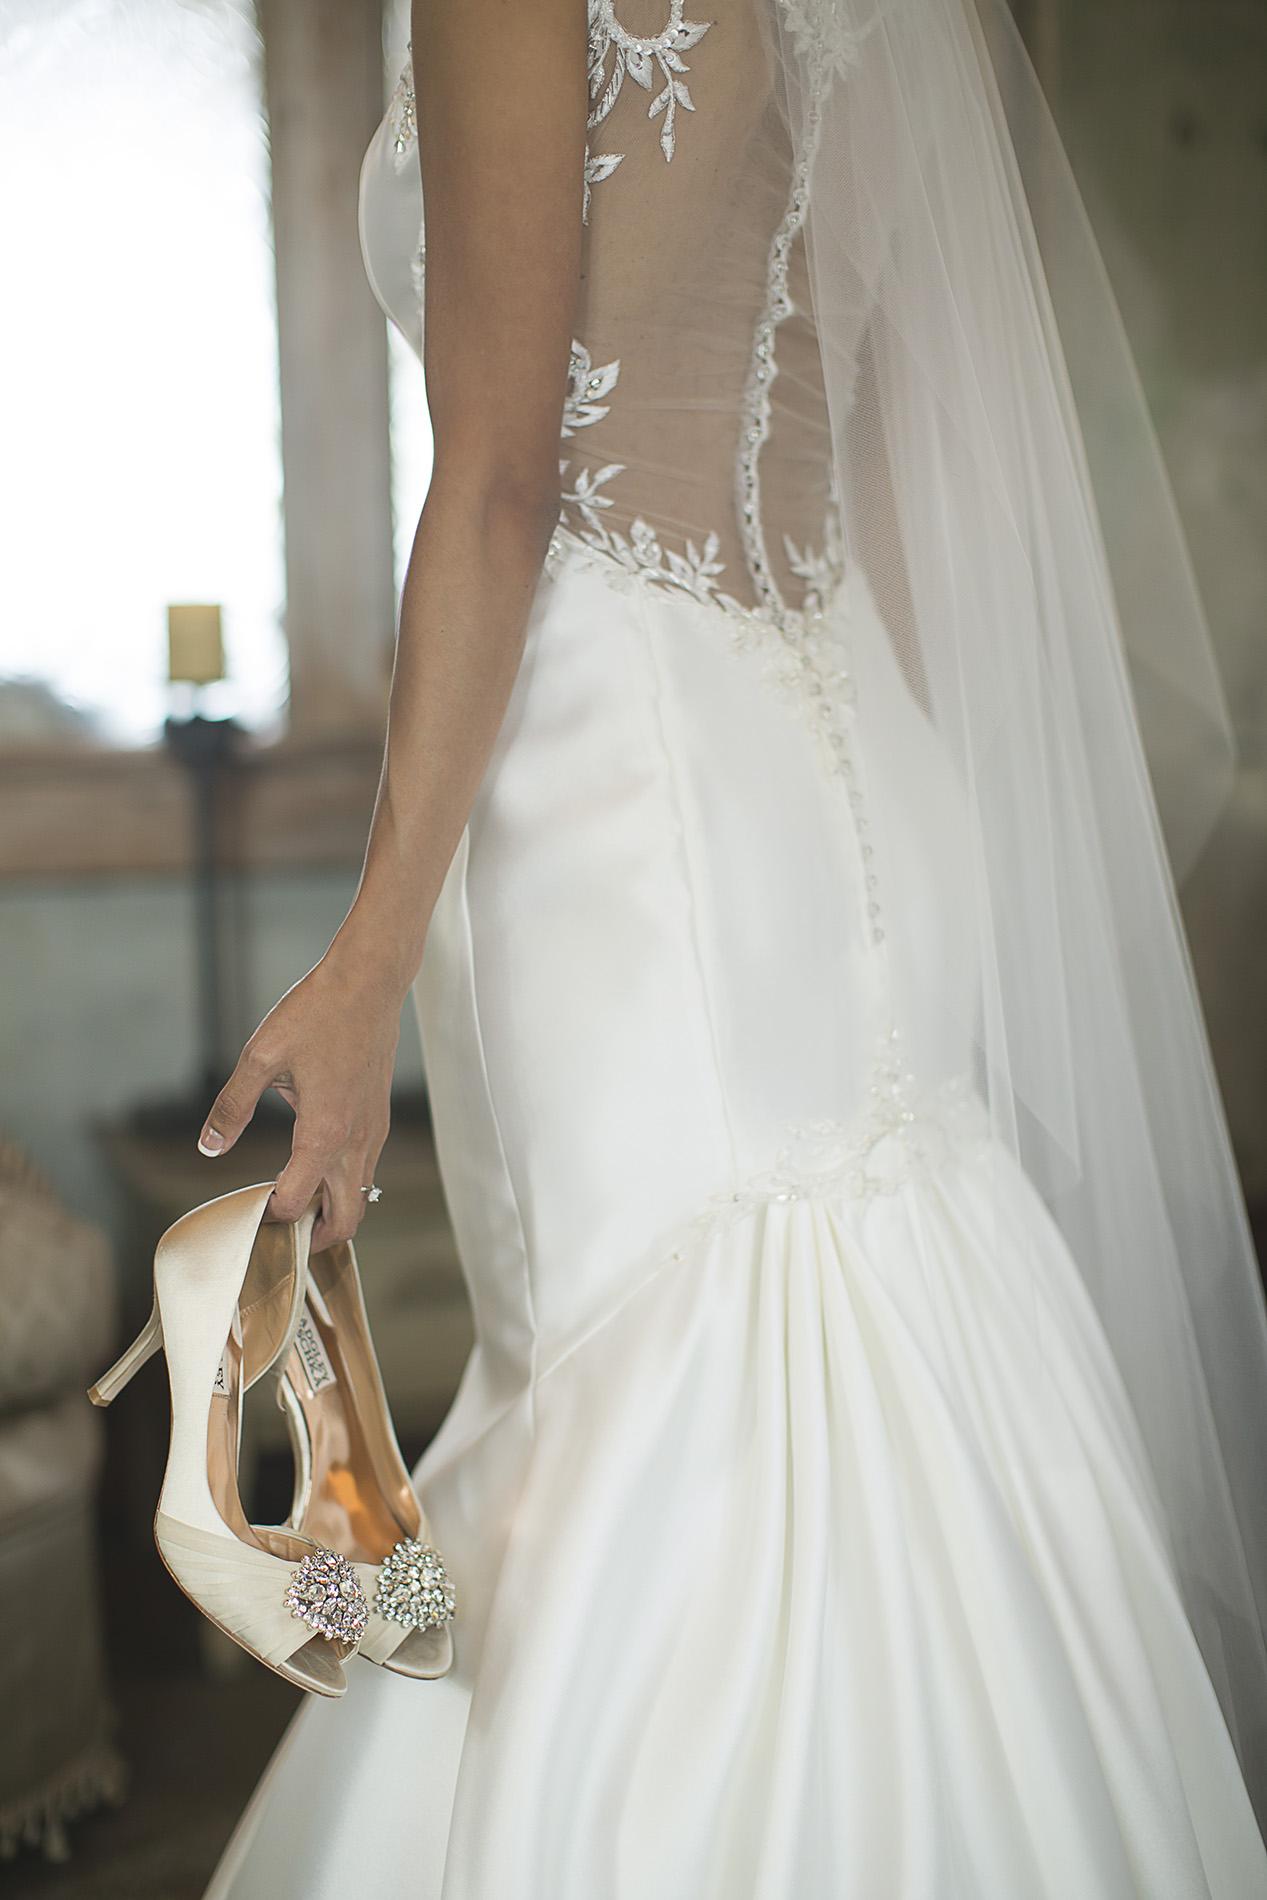 Houston-venue-Olde-Dobbin-Station-Romantic-Classic-Wedding-Photographer-011.jpg